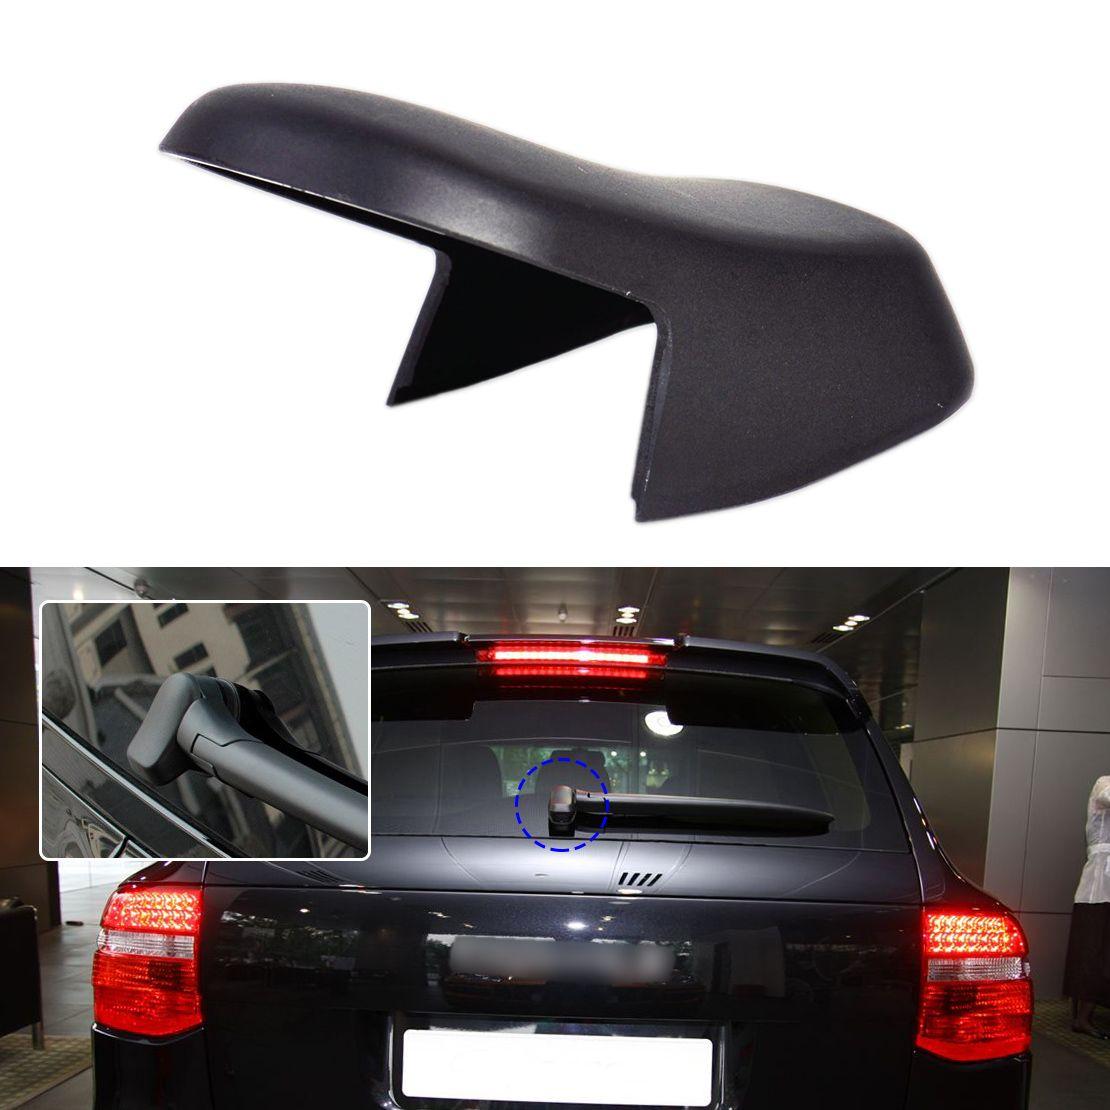 DWCX Car Rear Wiper Arm Base Cover Switch Cap Replacement 95562832000 fit for Porsche Cayenne 2004 2005 2006 2007 2008 2009 2010